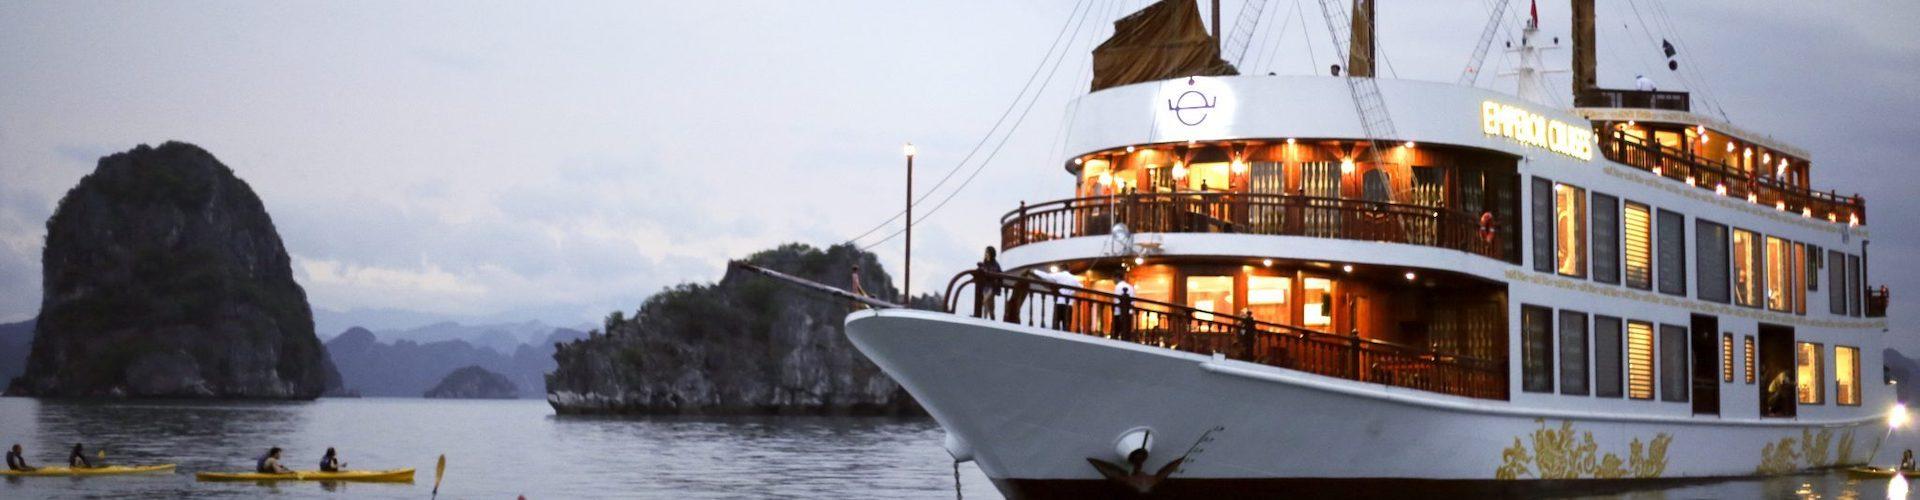 Emperor Cruise